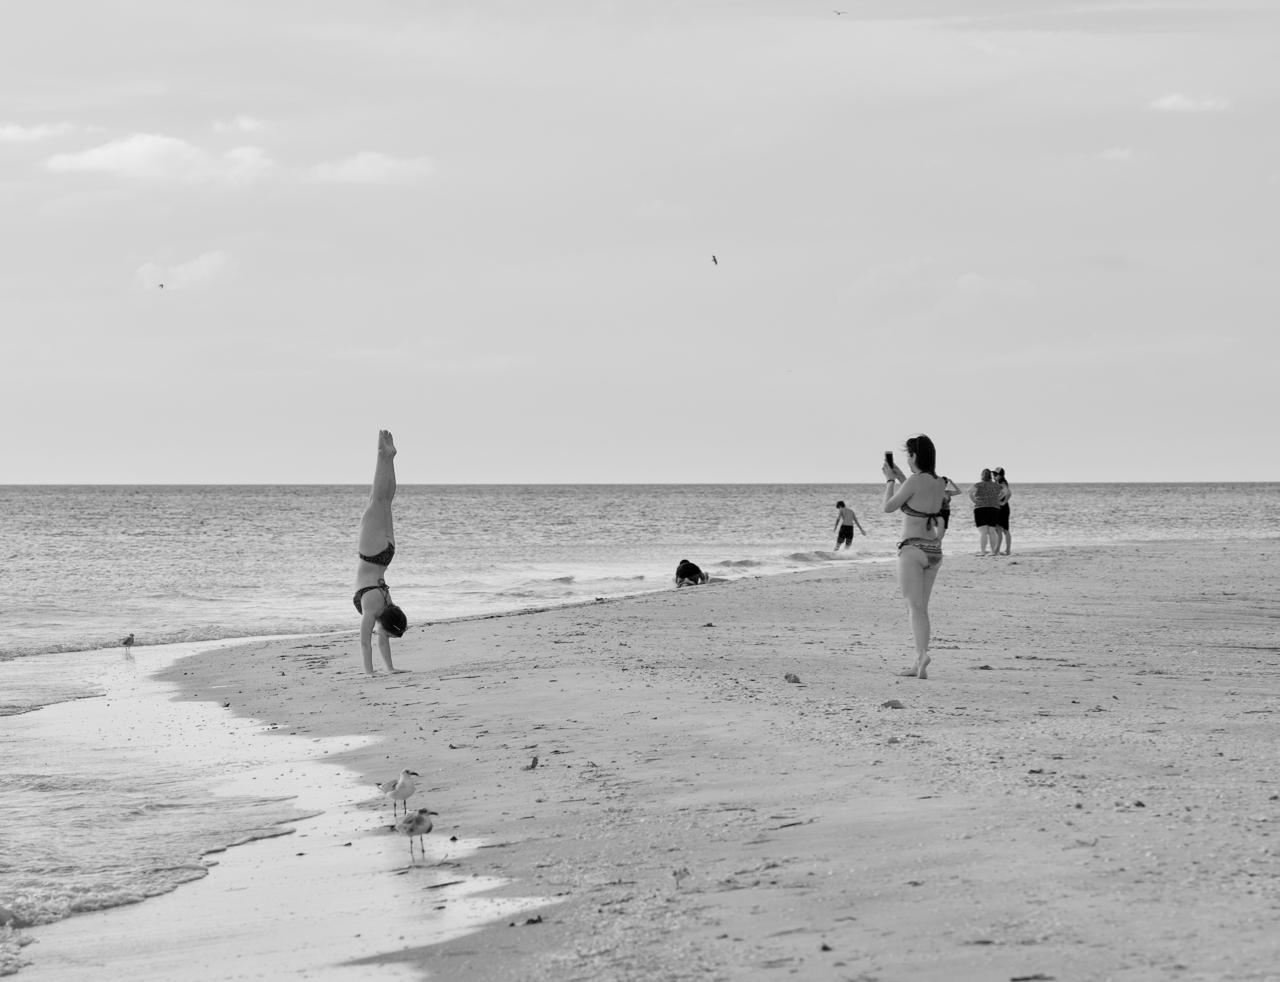 Standing. Lido Key. Sarasota, Florida. October 2017. © William D. Walker